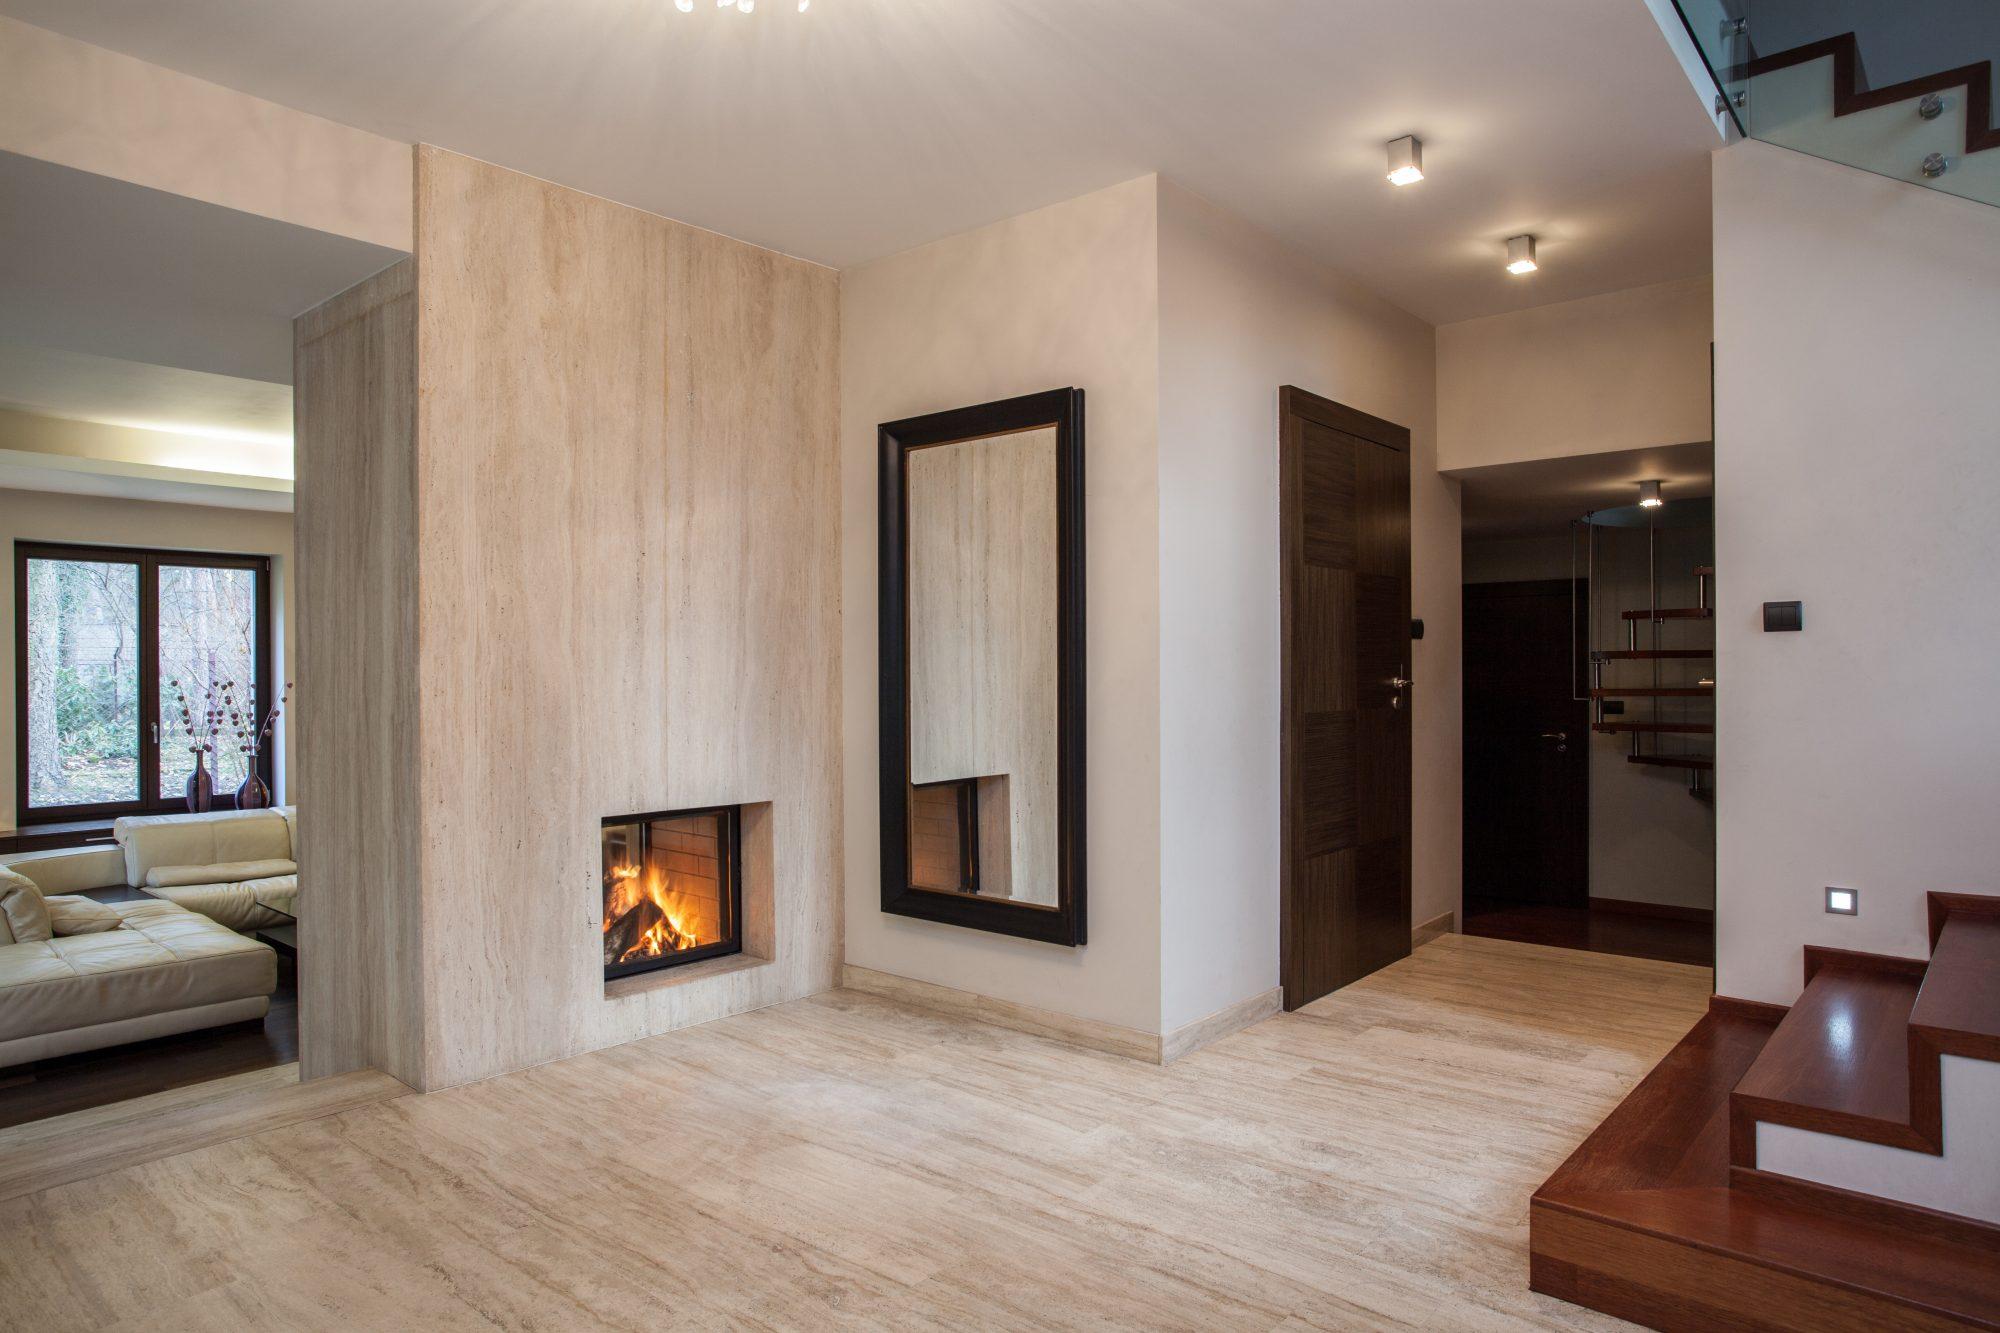 Atlantic Stone Source - Marble Flooring